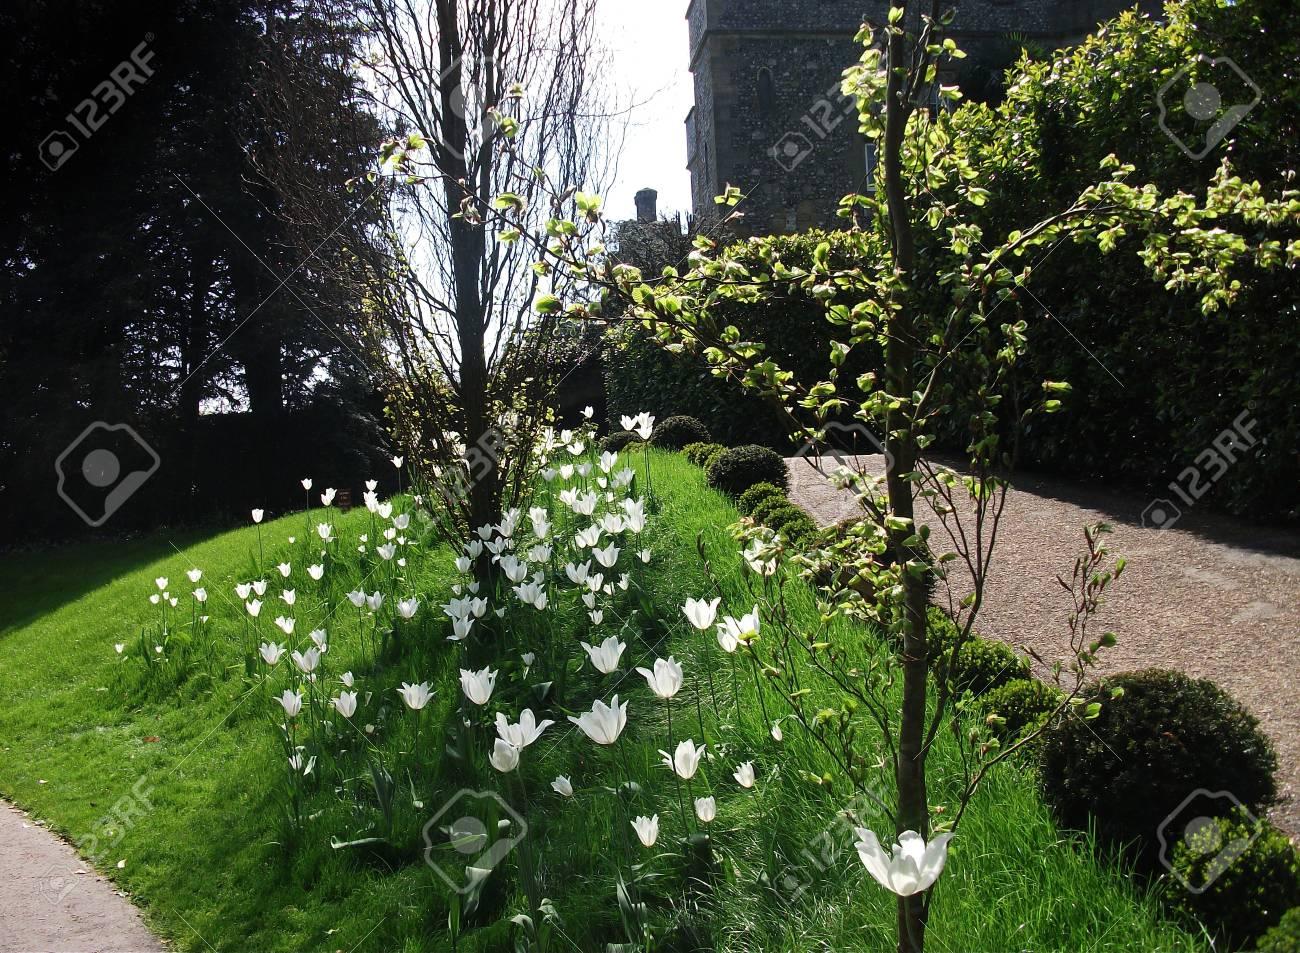 British flower border with grass white flowers and small trees british flower border with grass white flowers and small trees early spring stock photo mightylinksfo